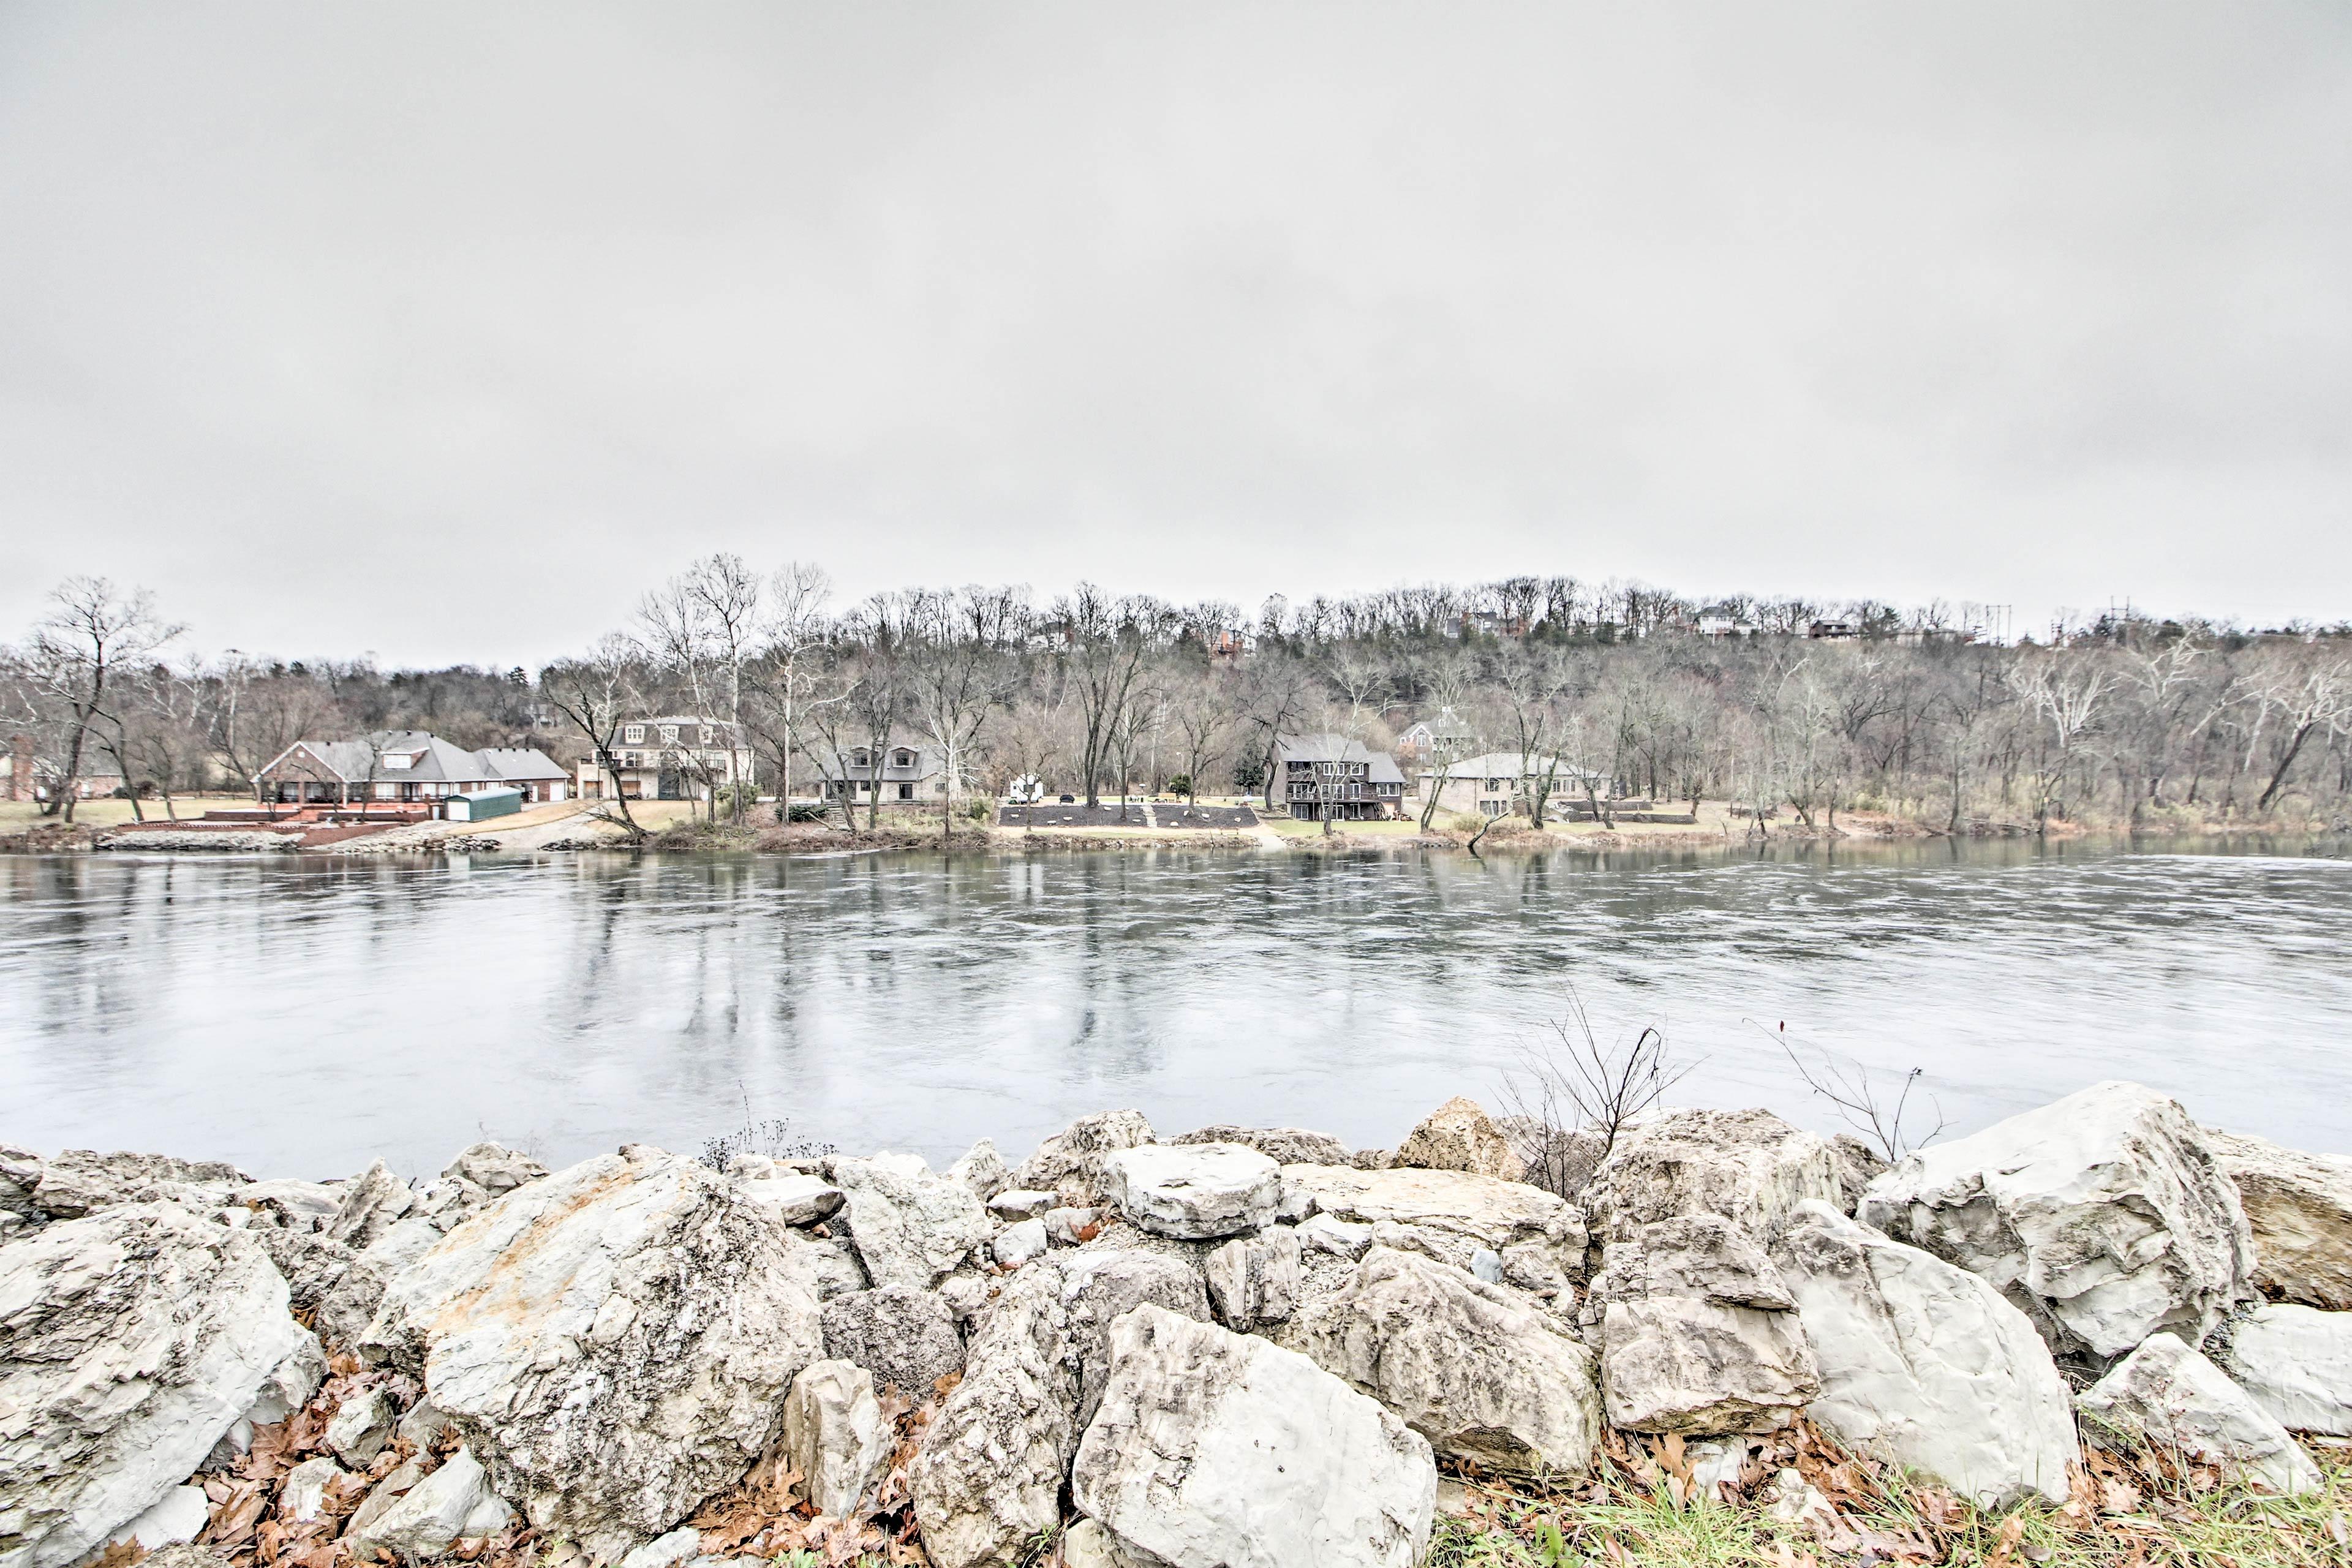 Fall Creek Marina is less than a half mile away.